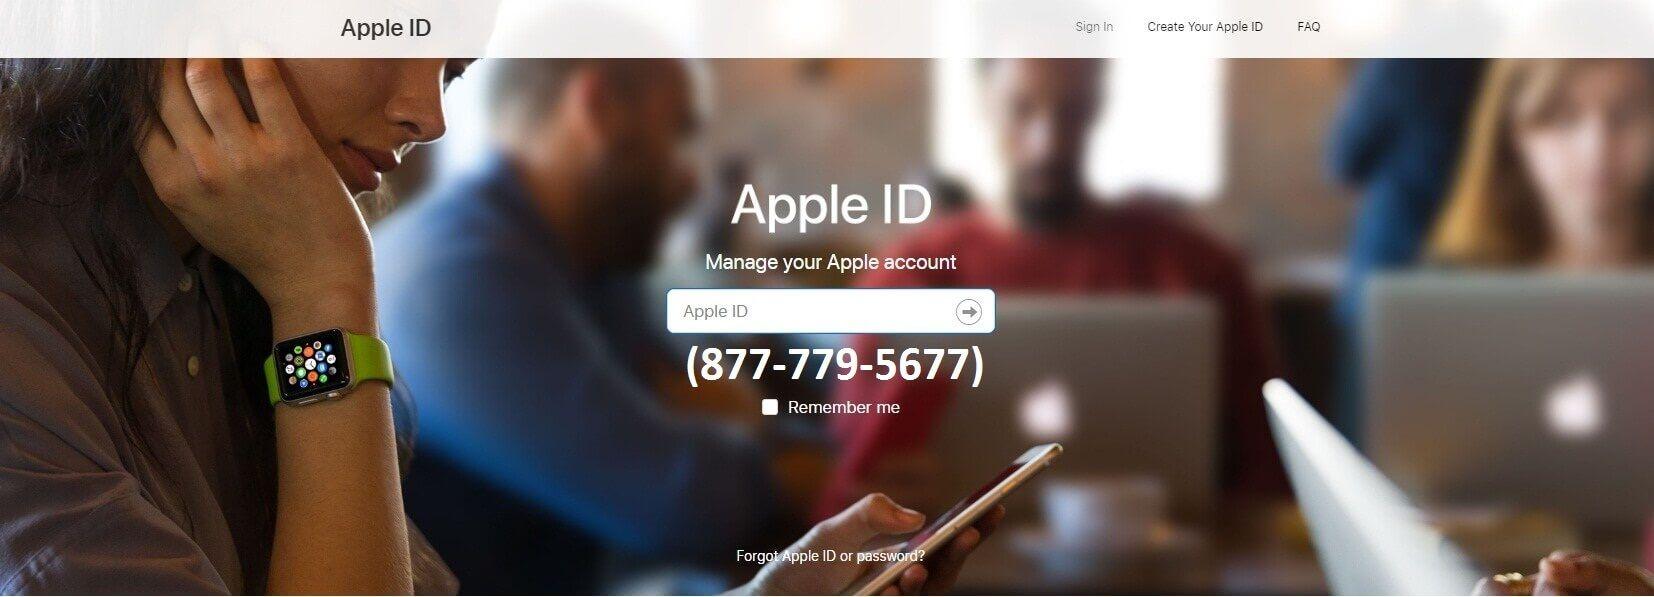 forgot apple password on iphone x